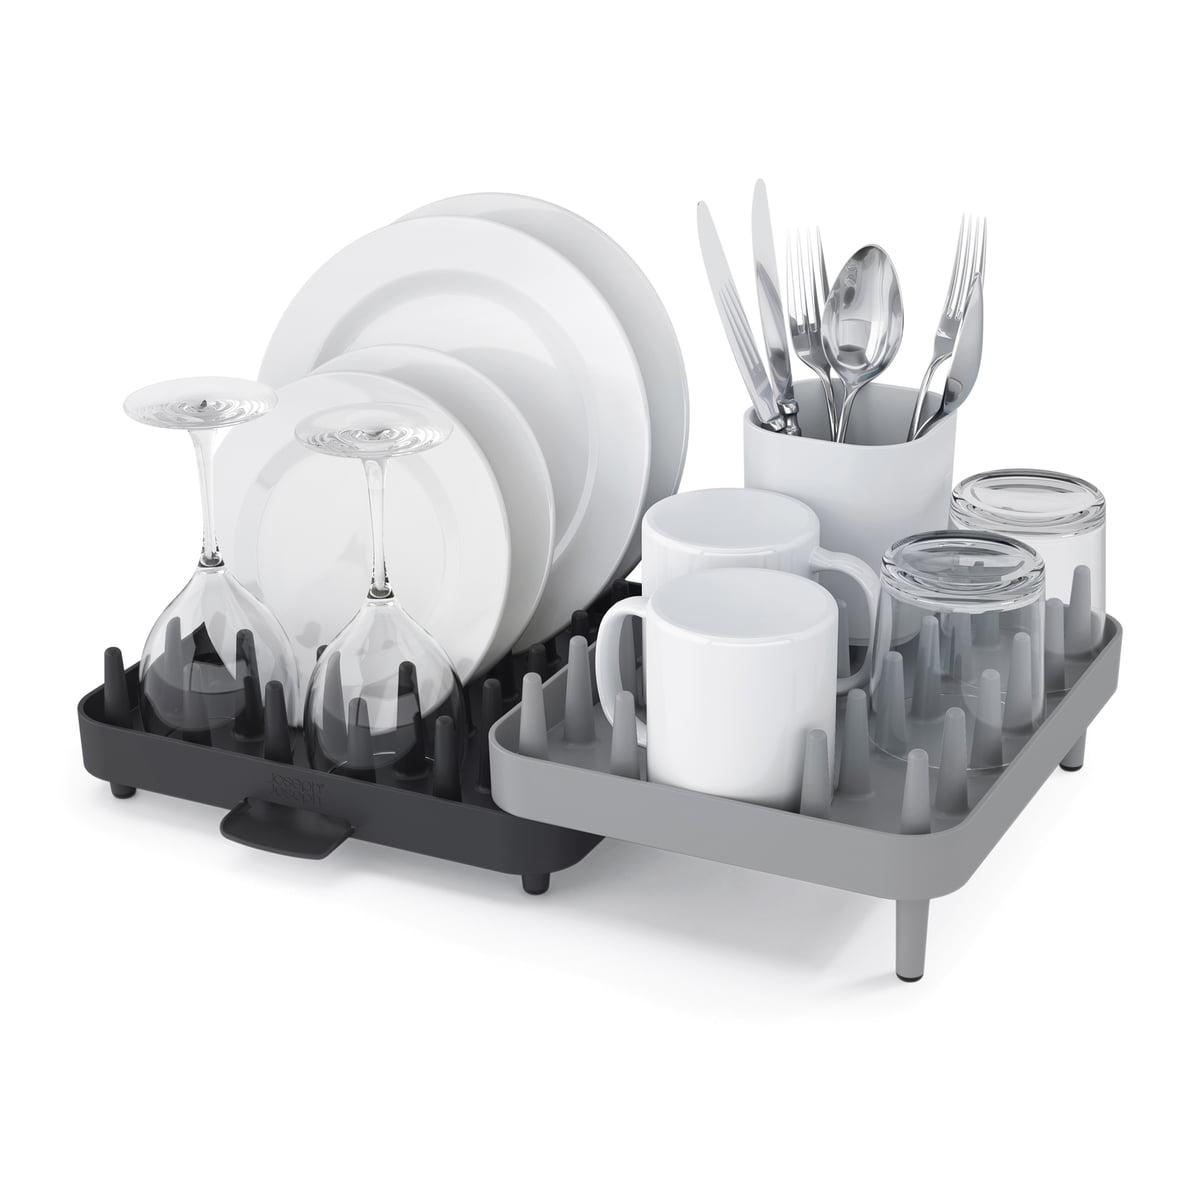 Connect Abtropfgestell (3er-Set), weiß-grau